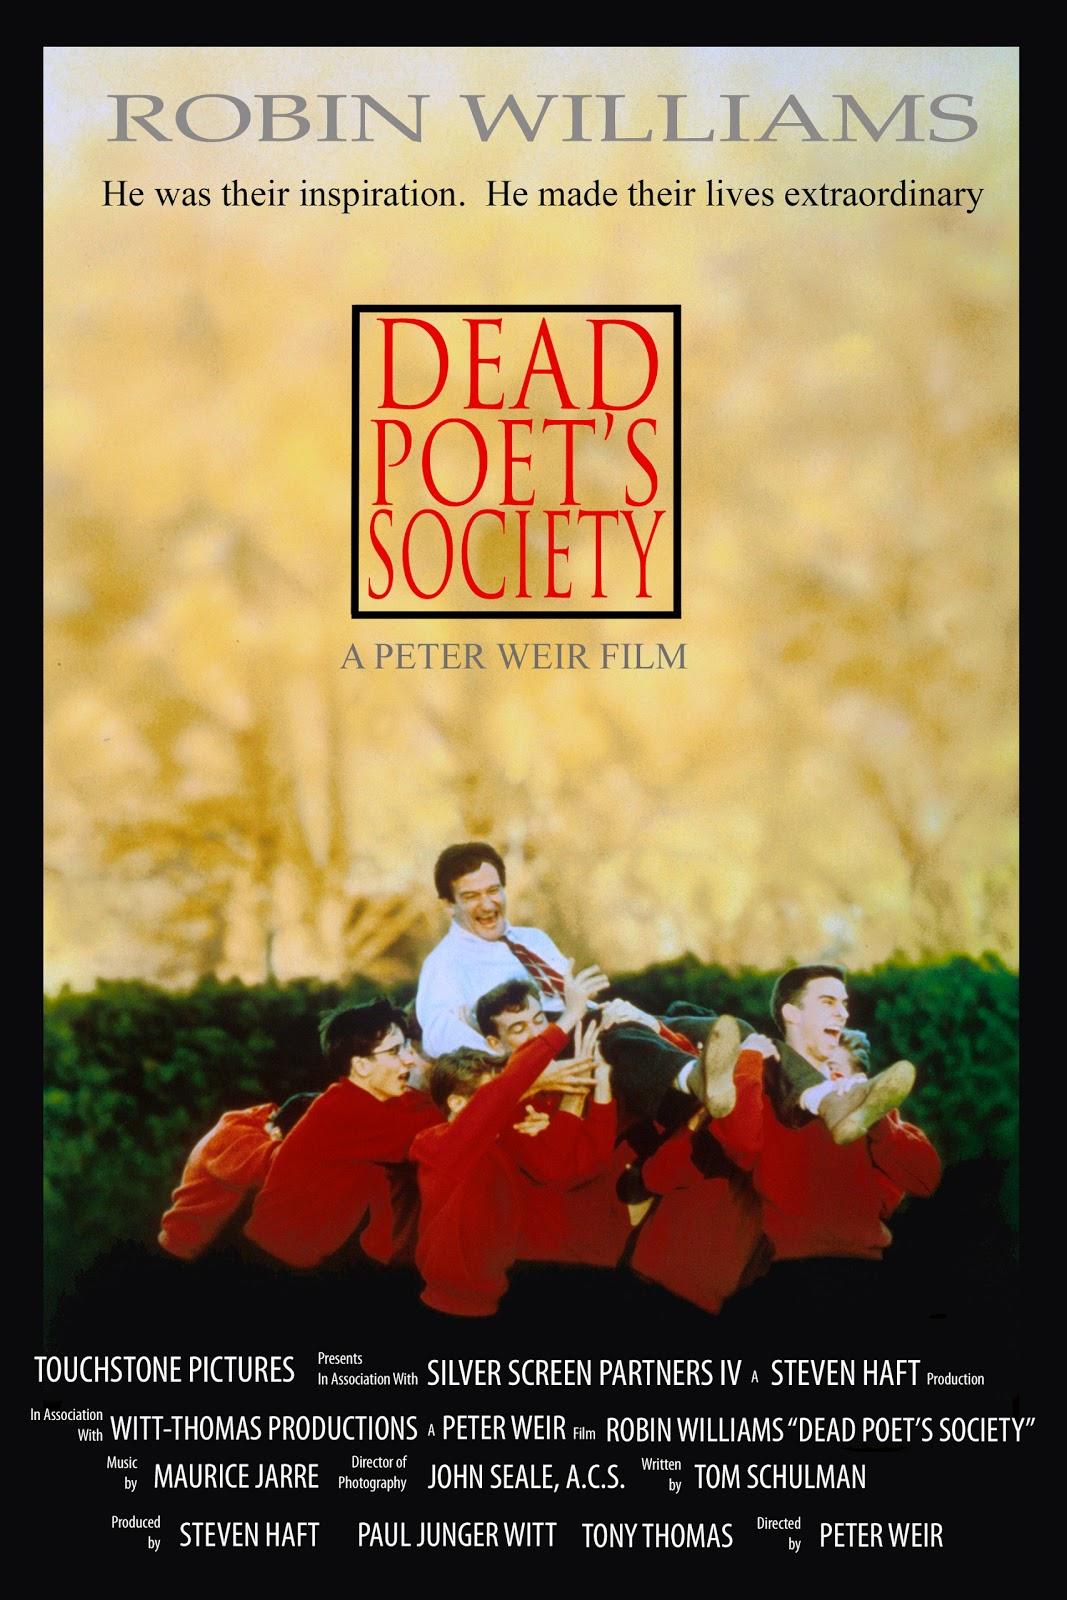 http://4.bp.blogspot.com/-WjDDZiZeFSY/TrnW-VqudJI/AAAAAAAABD4/BgFxPLlUrgA/s1600/Dead+Poets+Society.jpg